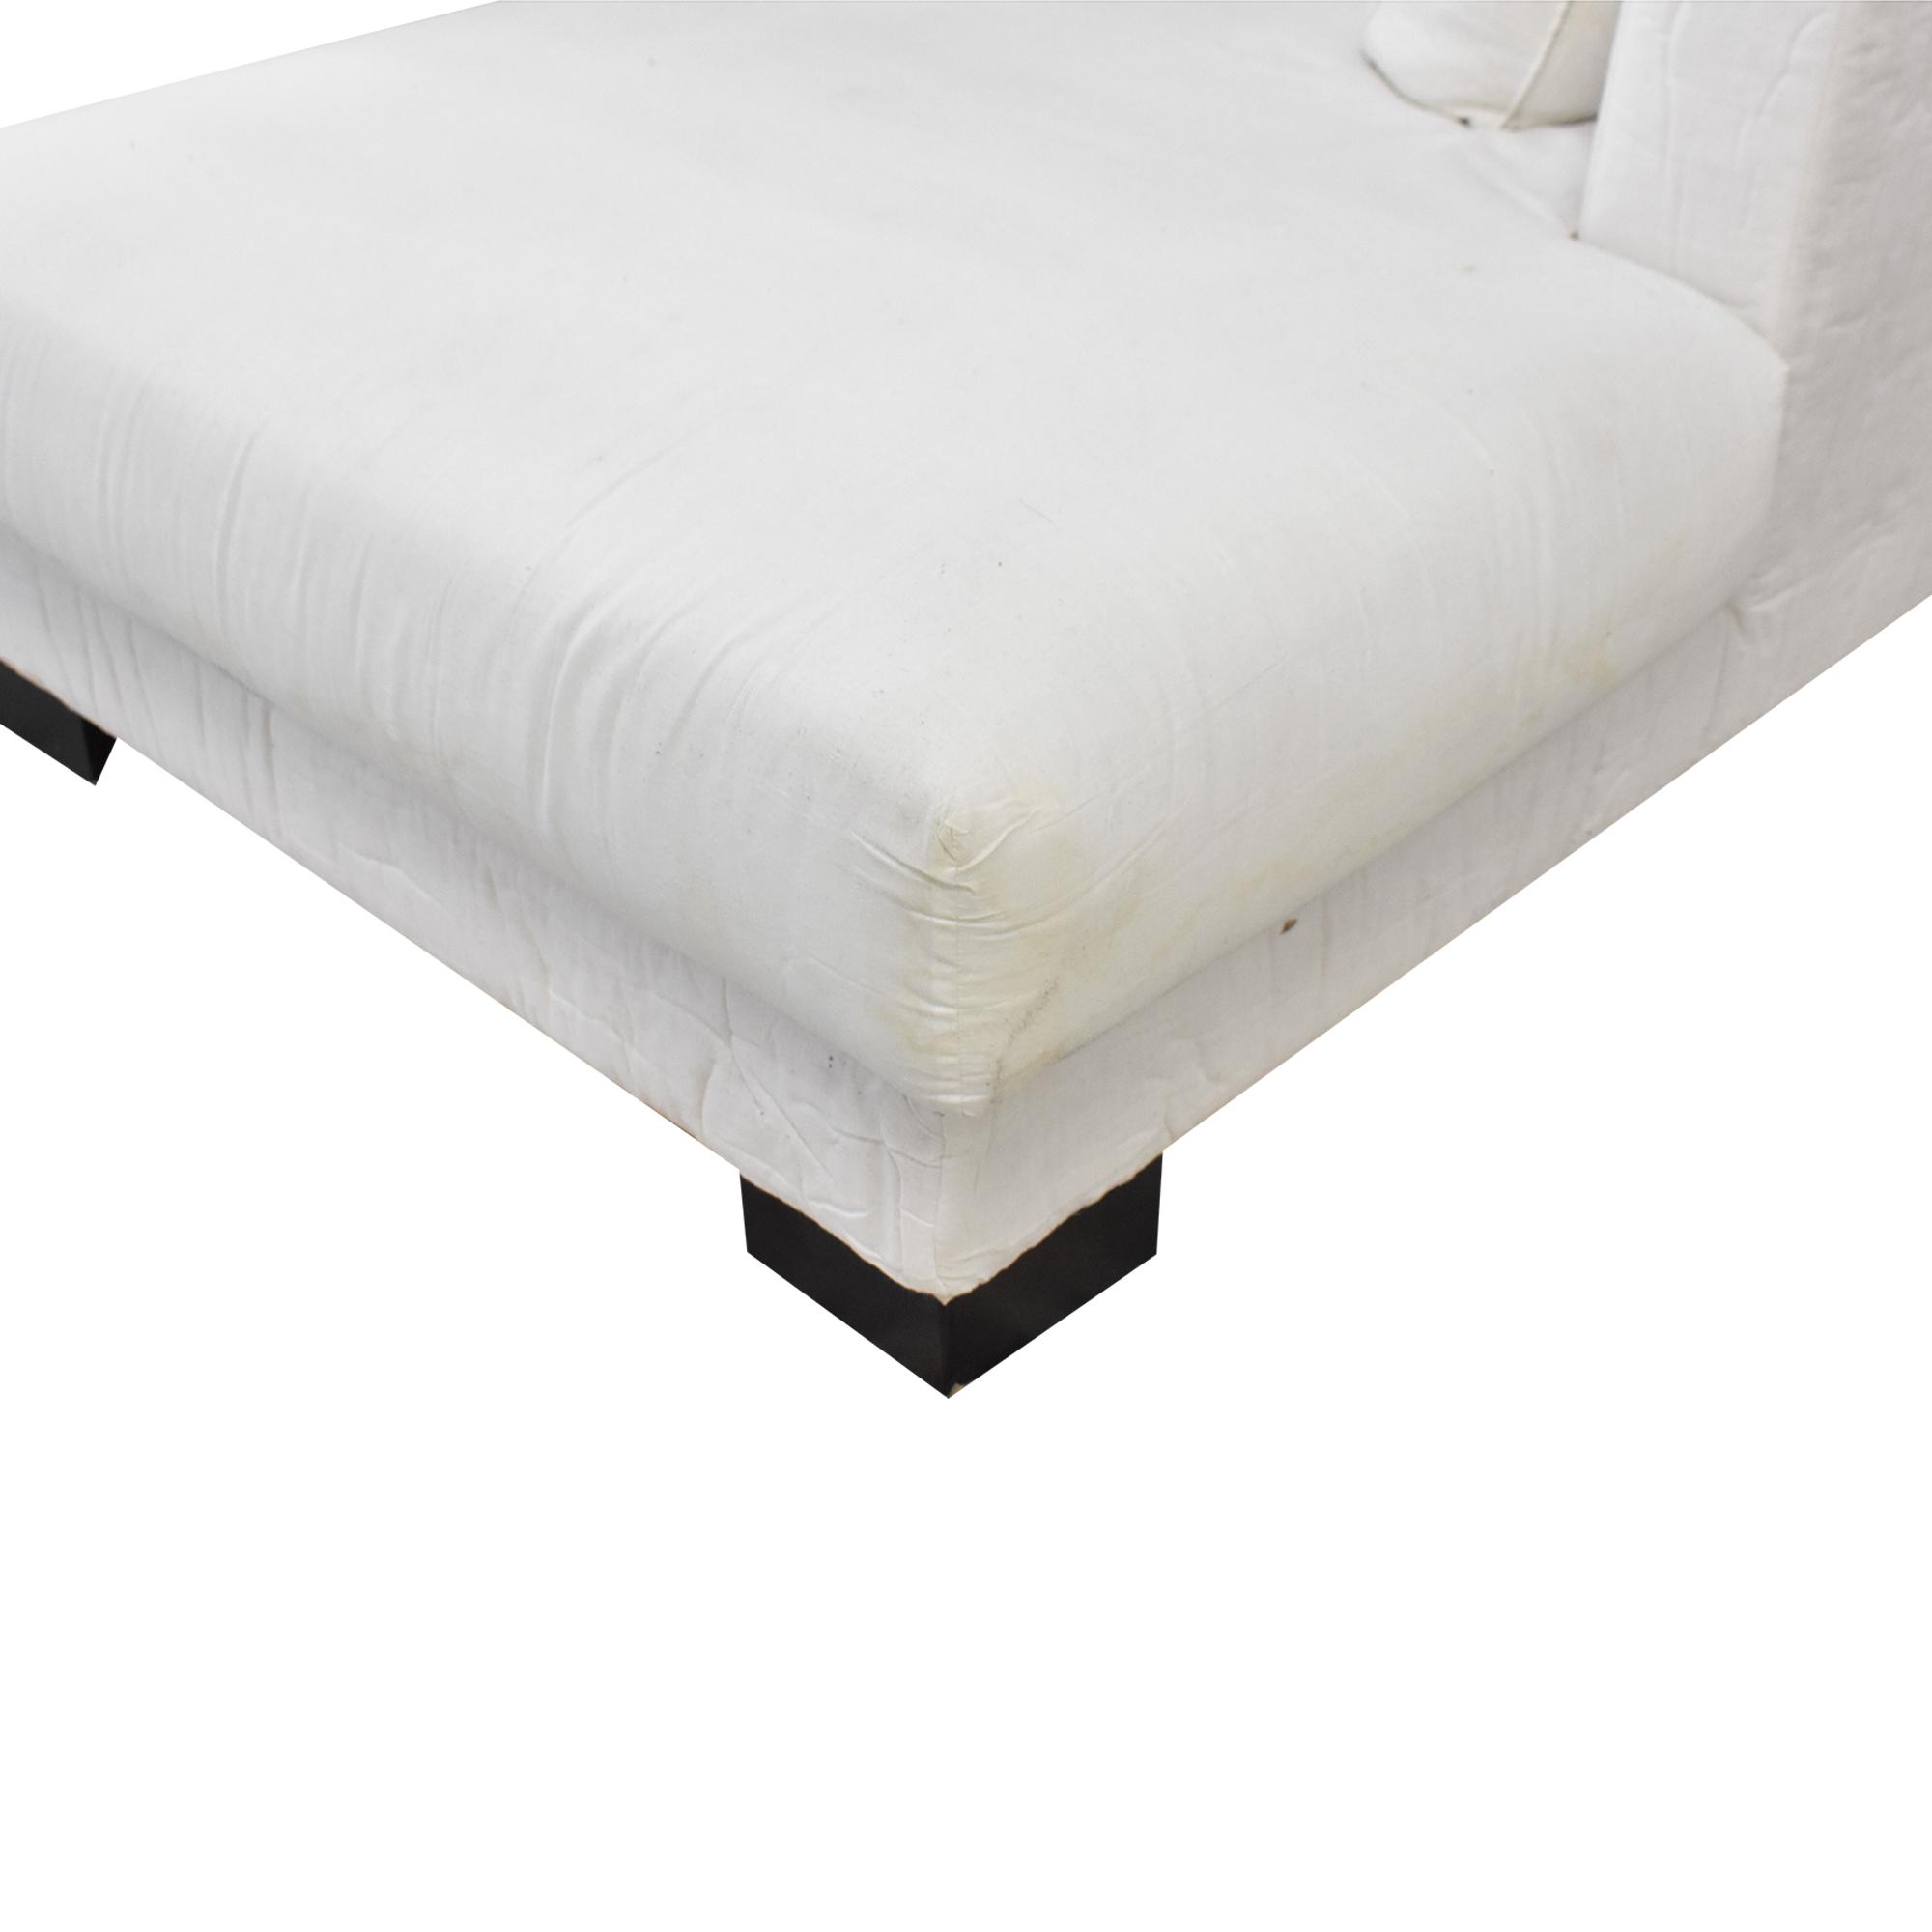 Verzelloni Verzelloni Link Sectional Sofa with Chaise